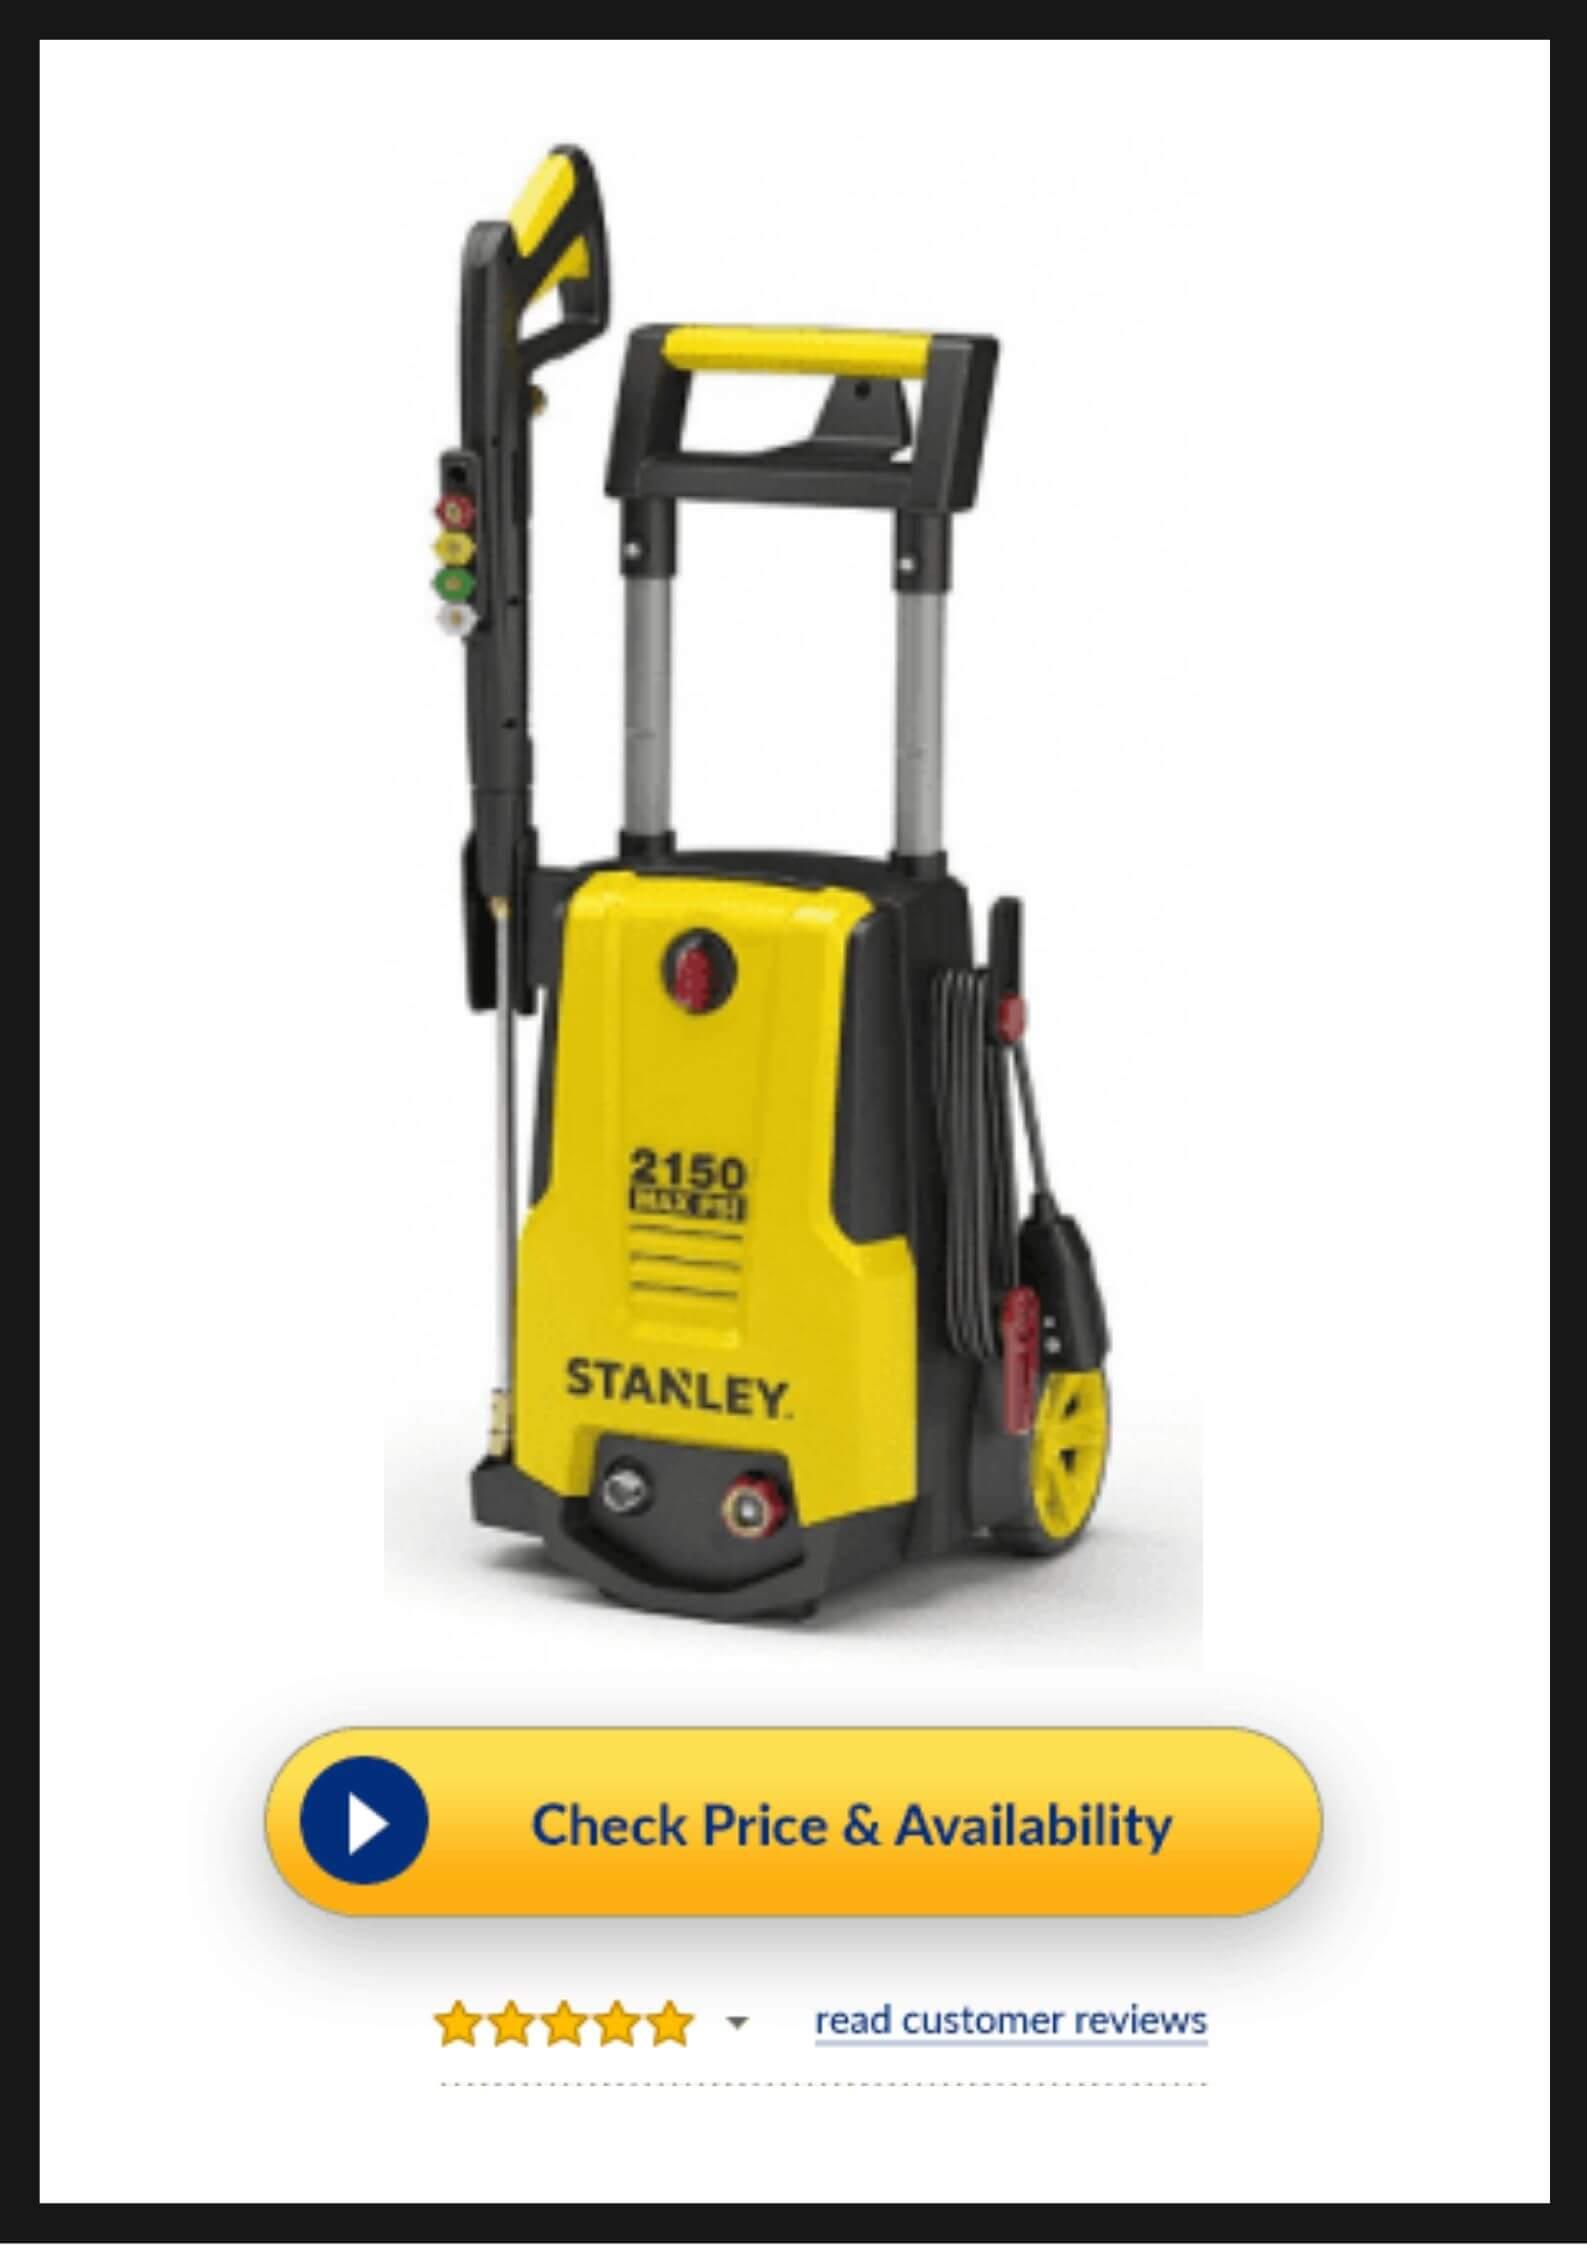 Stanley SHP2150 Car Wash Pressure Washer